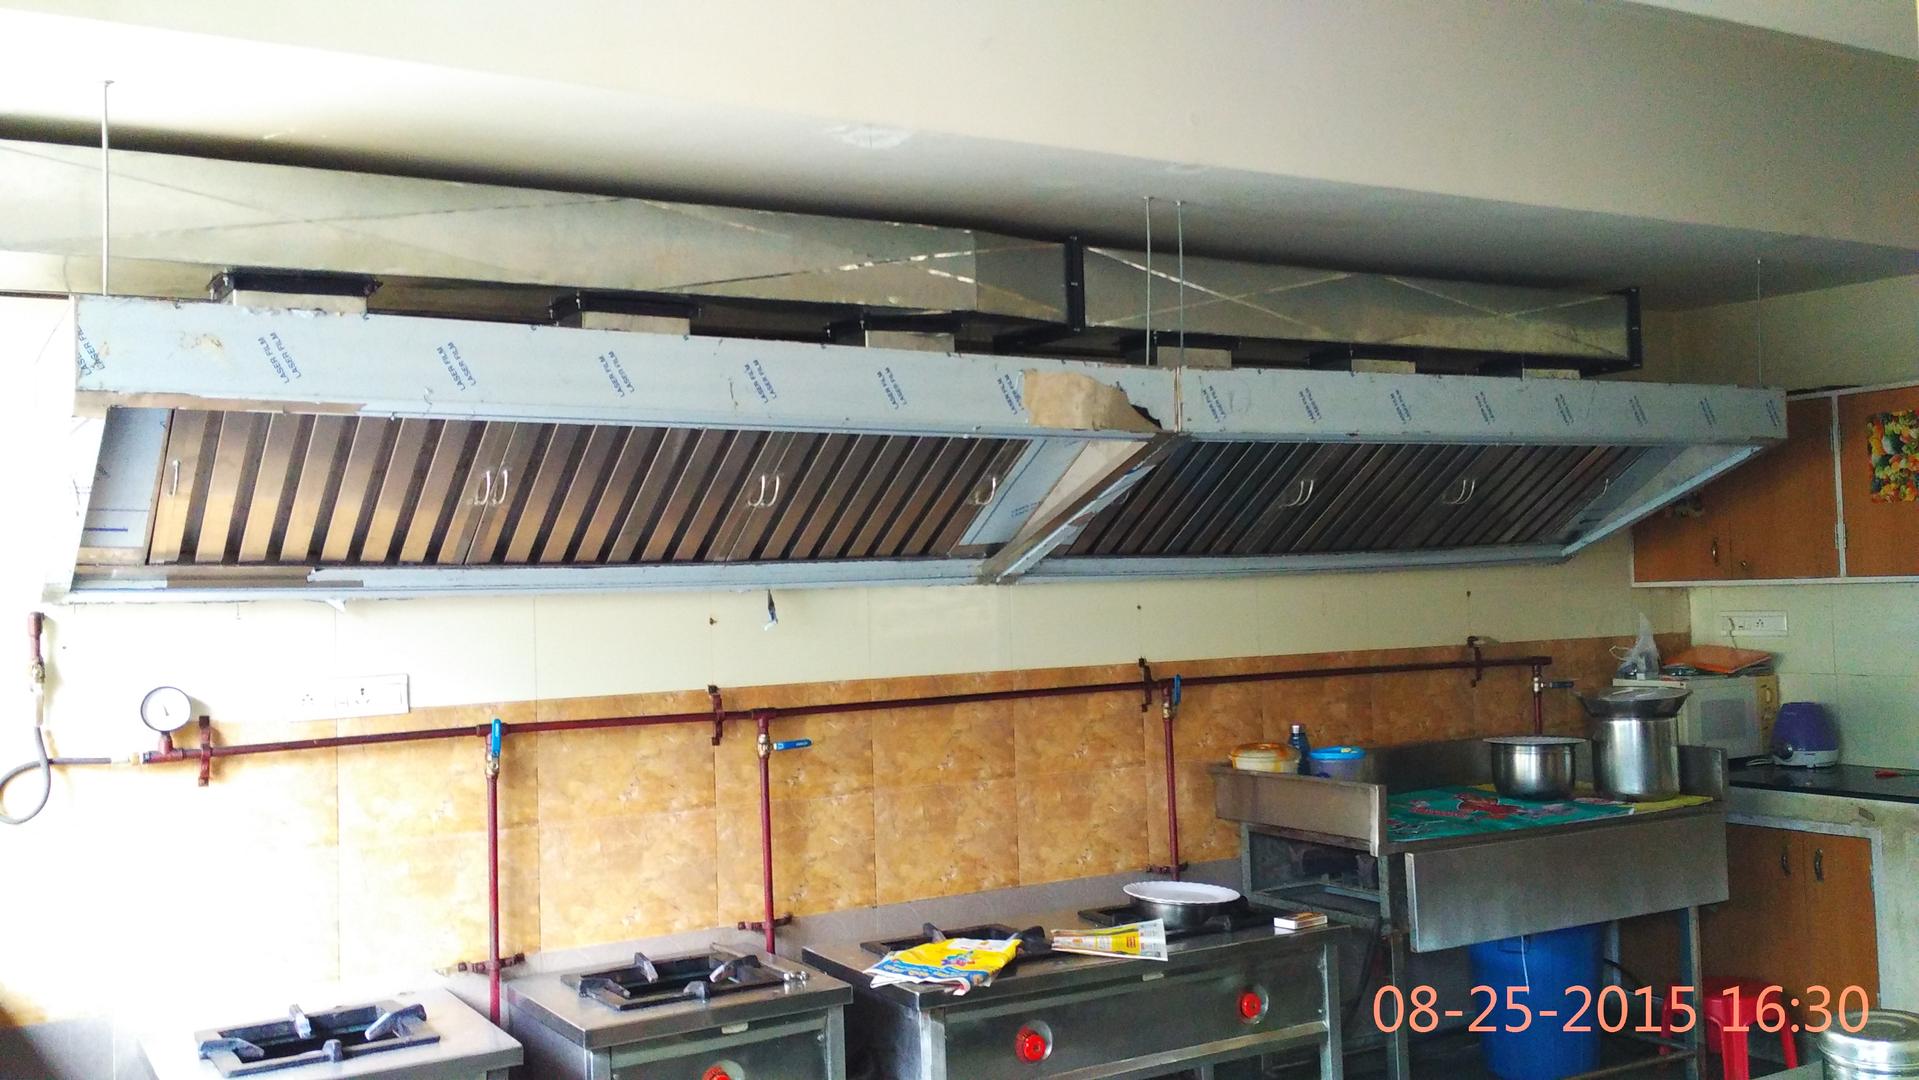 Restaurant Kitchen Vent Hood kitchen exhaust hood cleaning for restaurants kescor. industrial